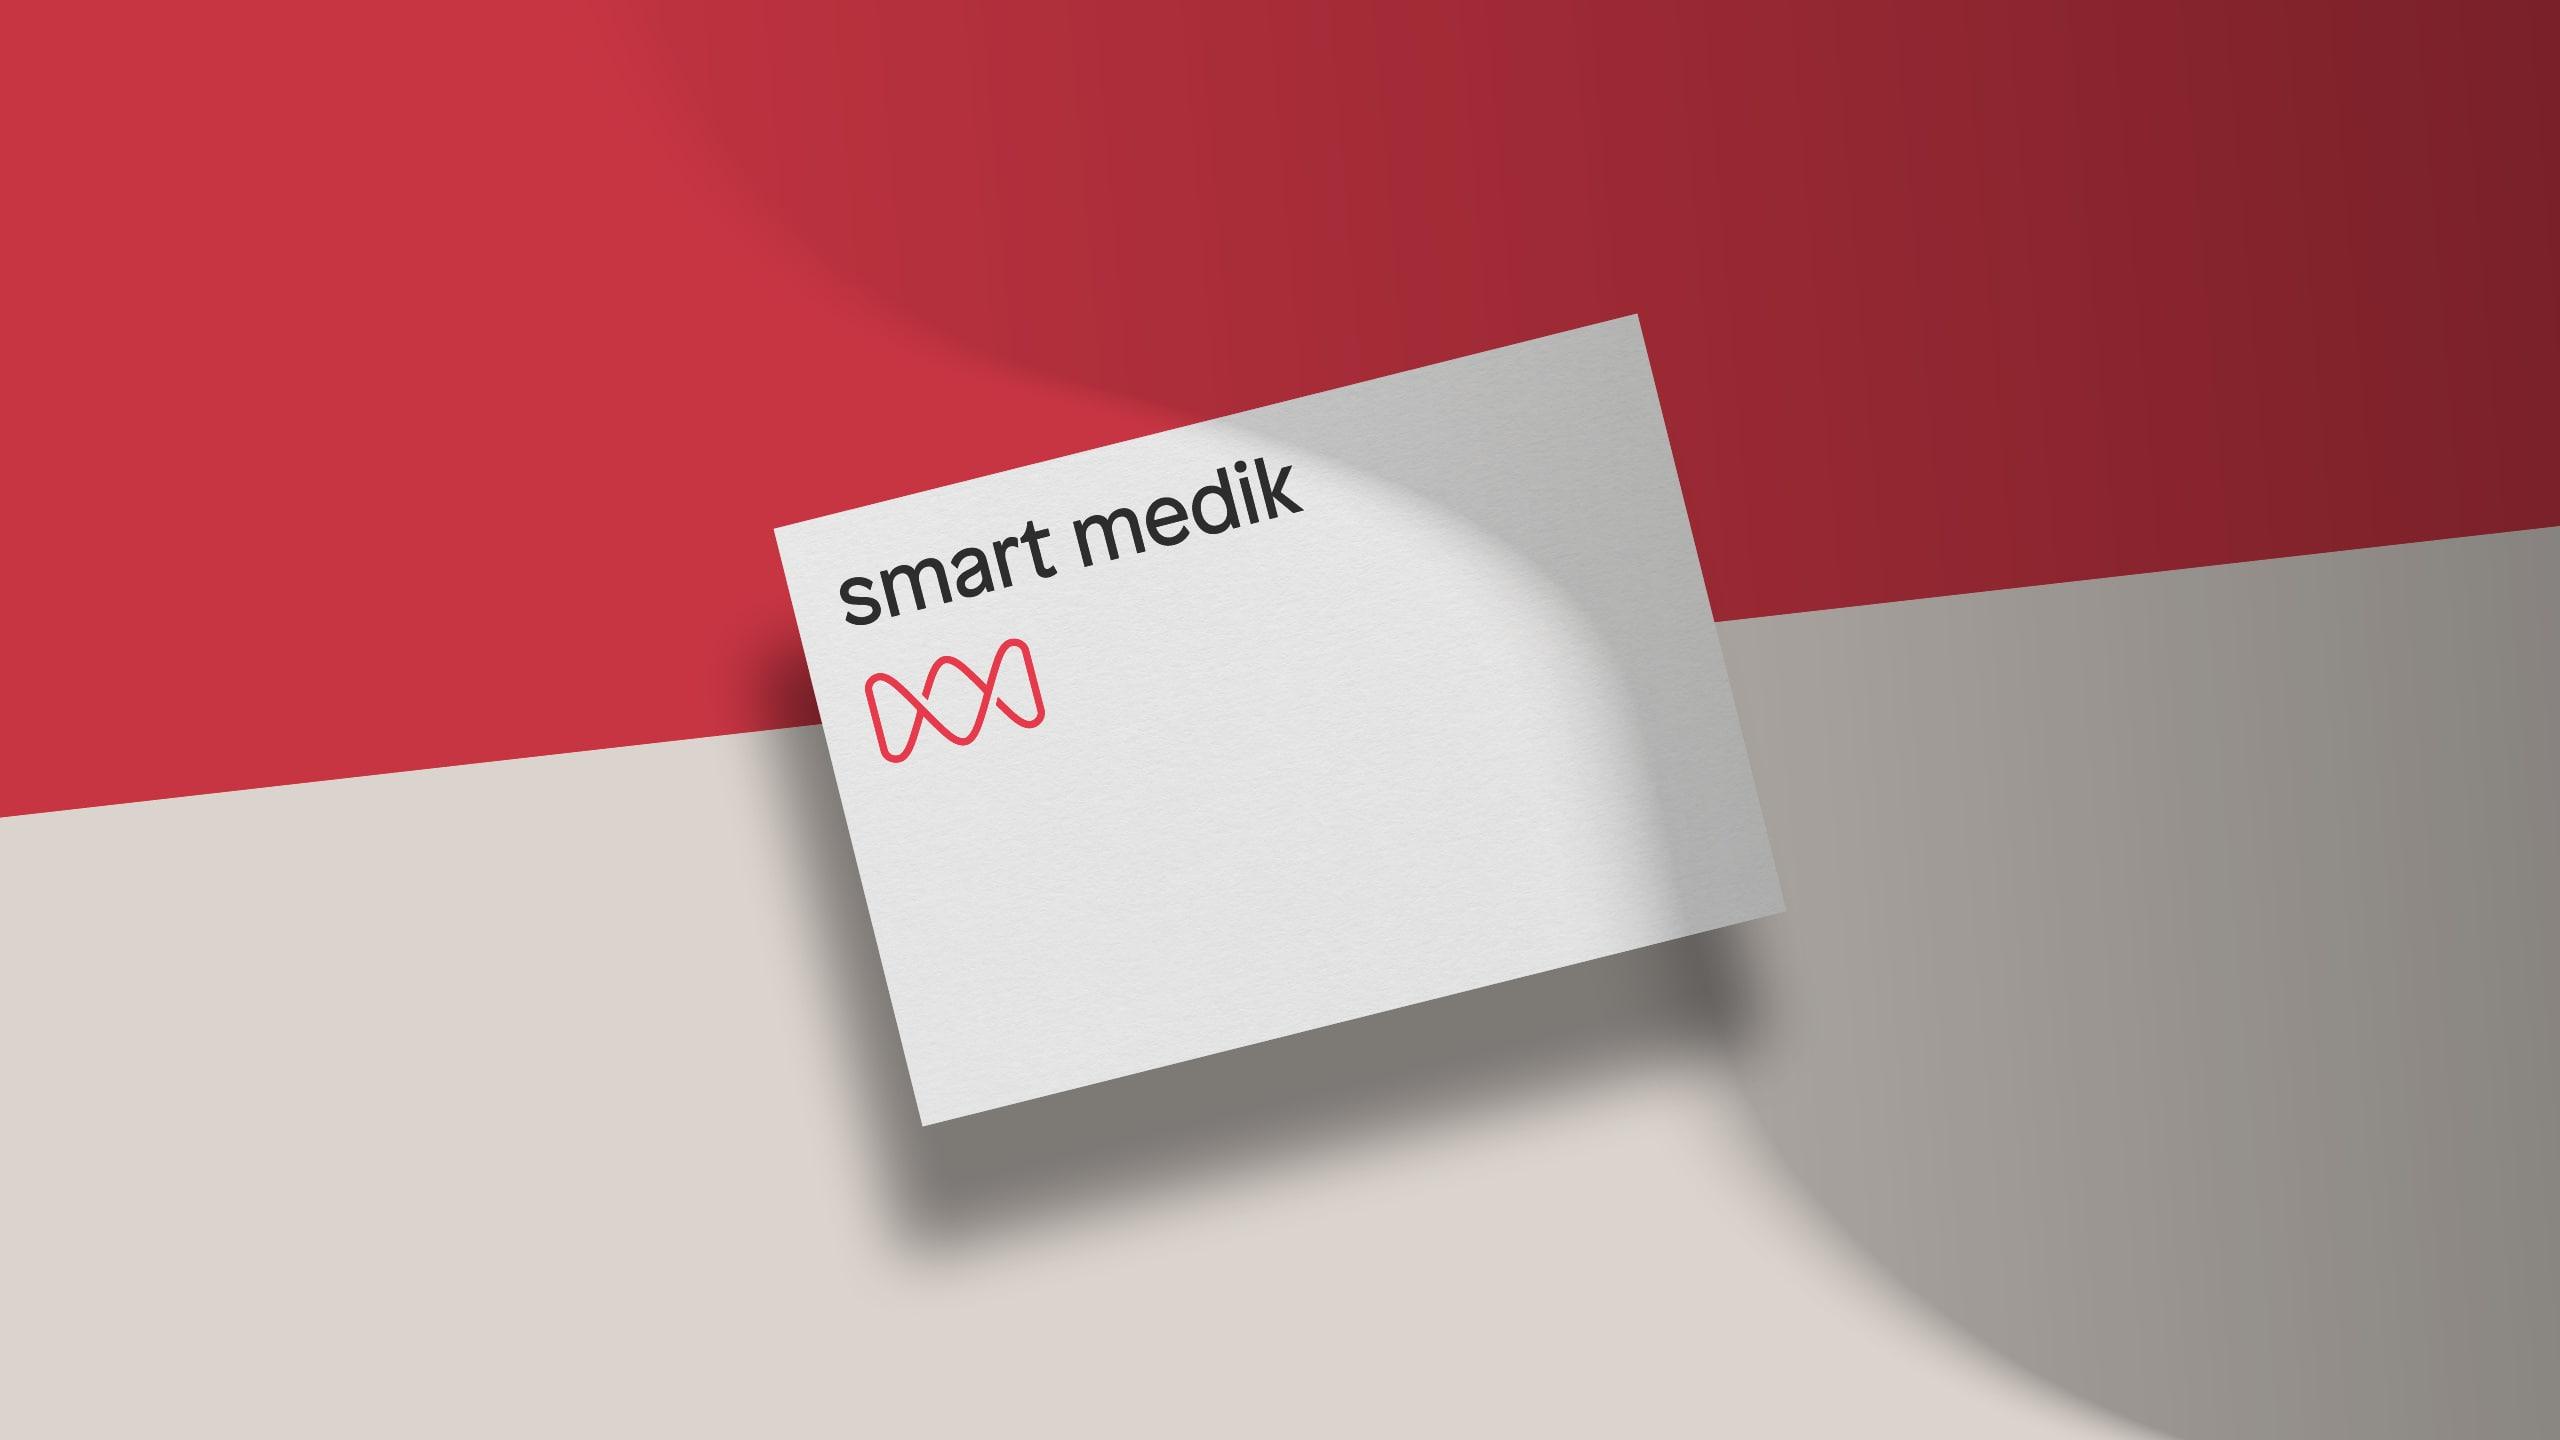 mantik-digital-branding-development-agency-creative-app-ui-web-branding-23-min-2